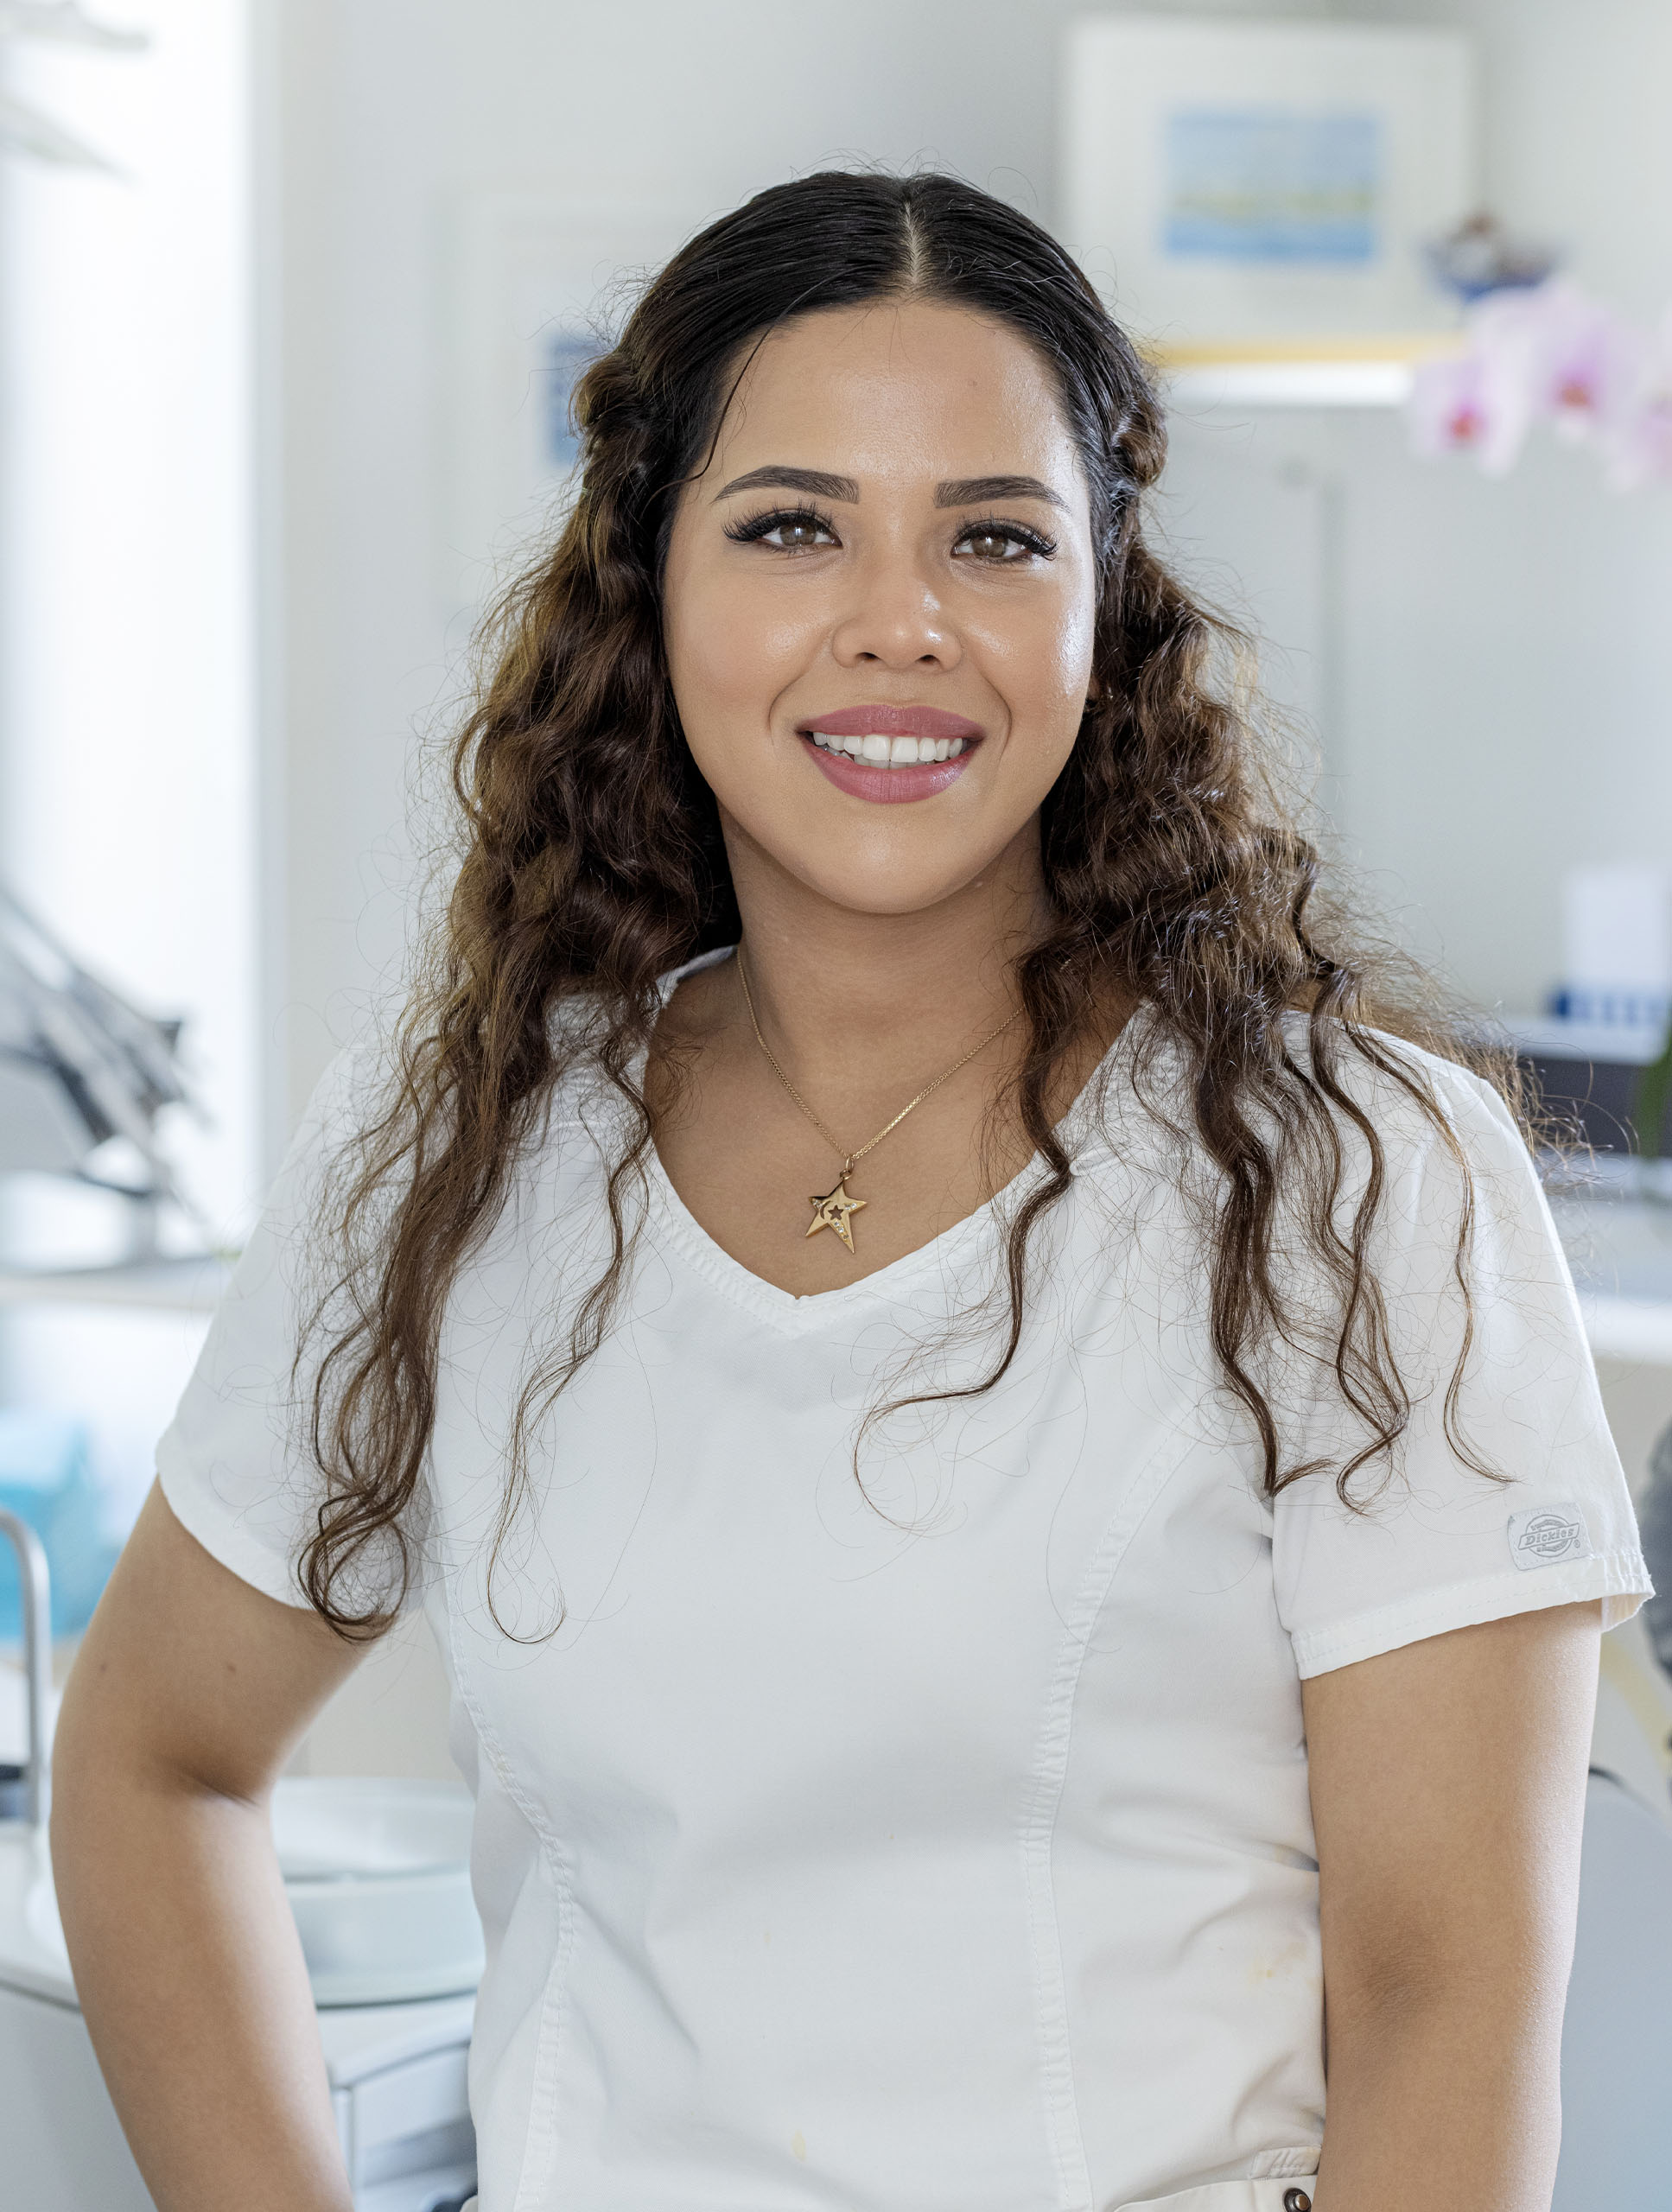 Tandvårdsbiträde Helena Ghazani